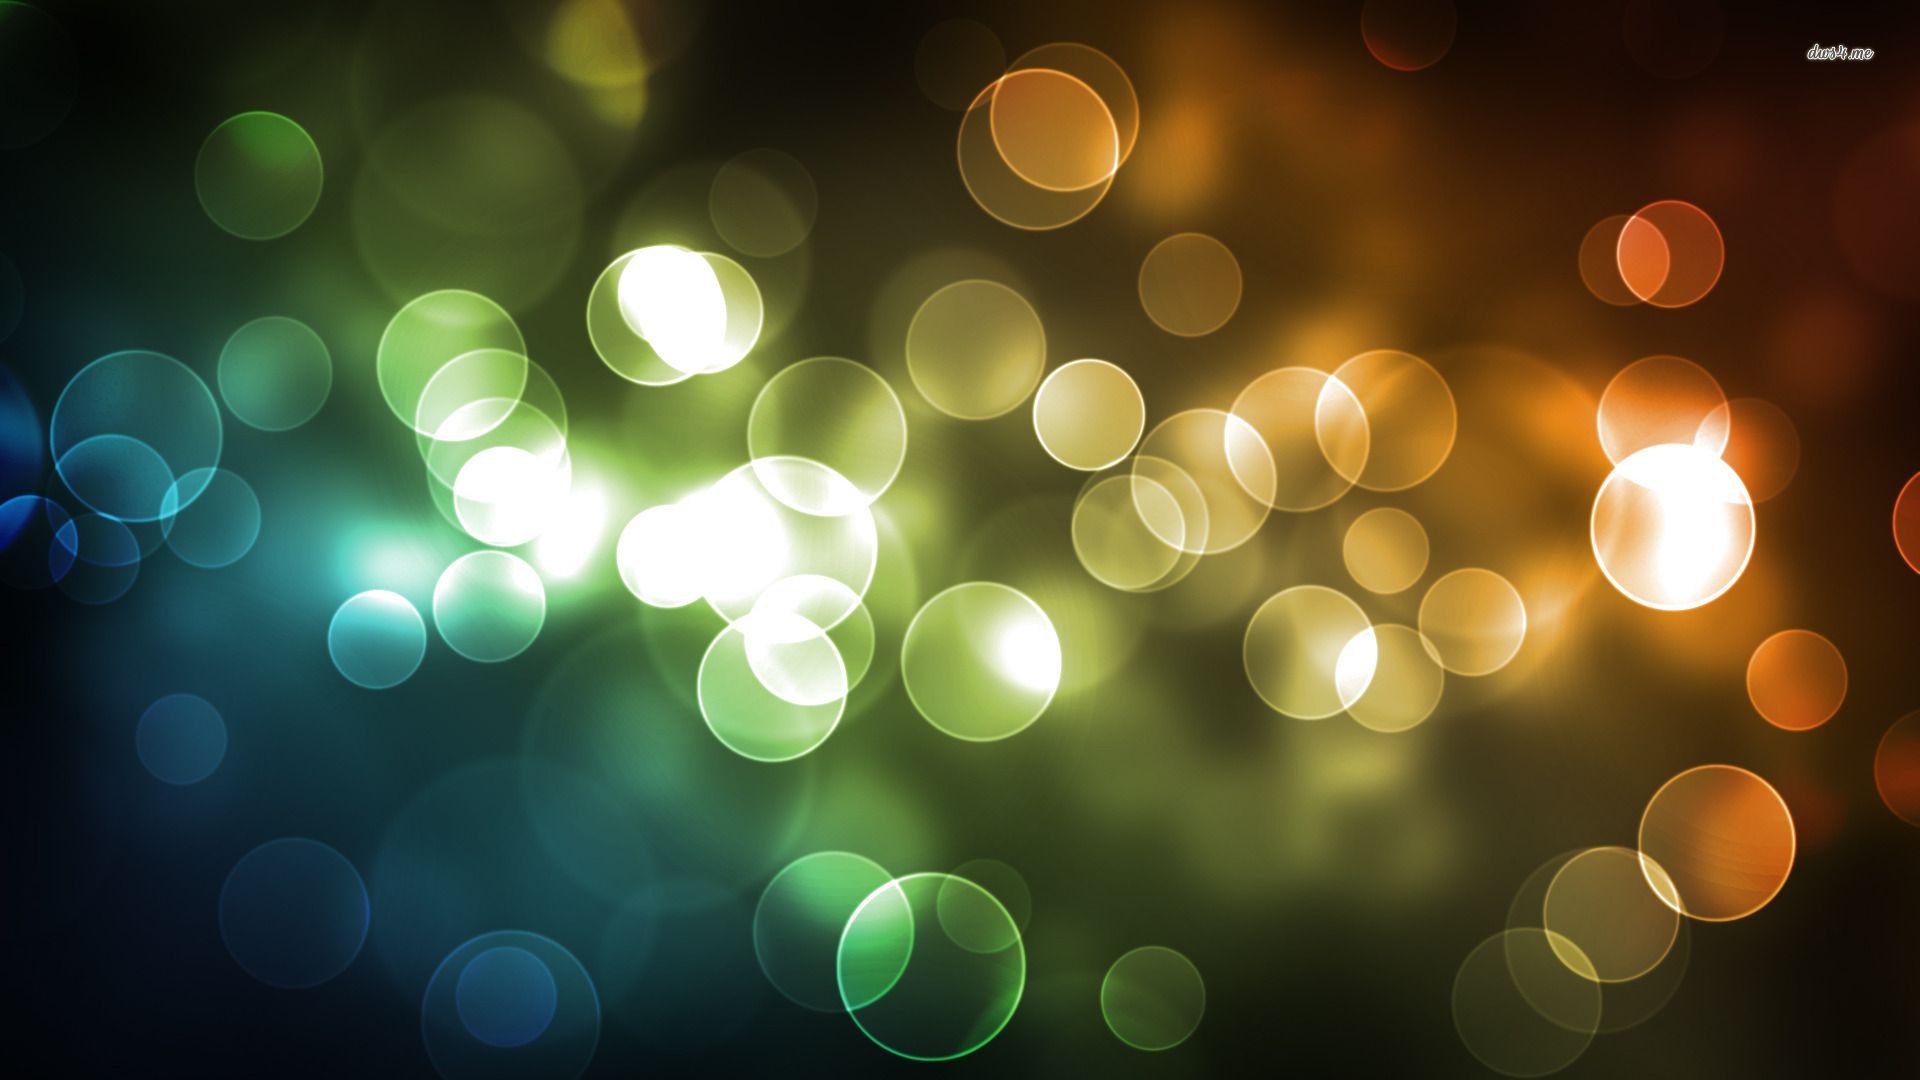 bubble wallpaper | hd wallpapers | pinterest | bubbles and wallpaper